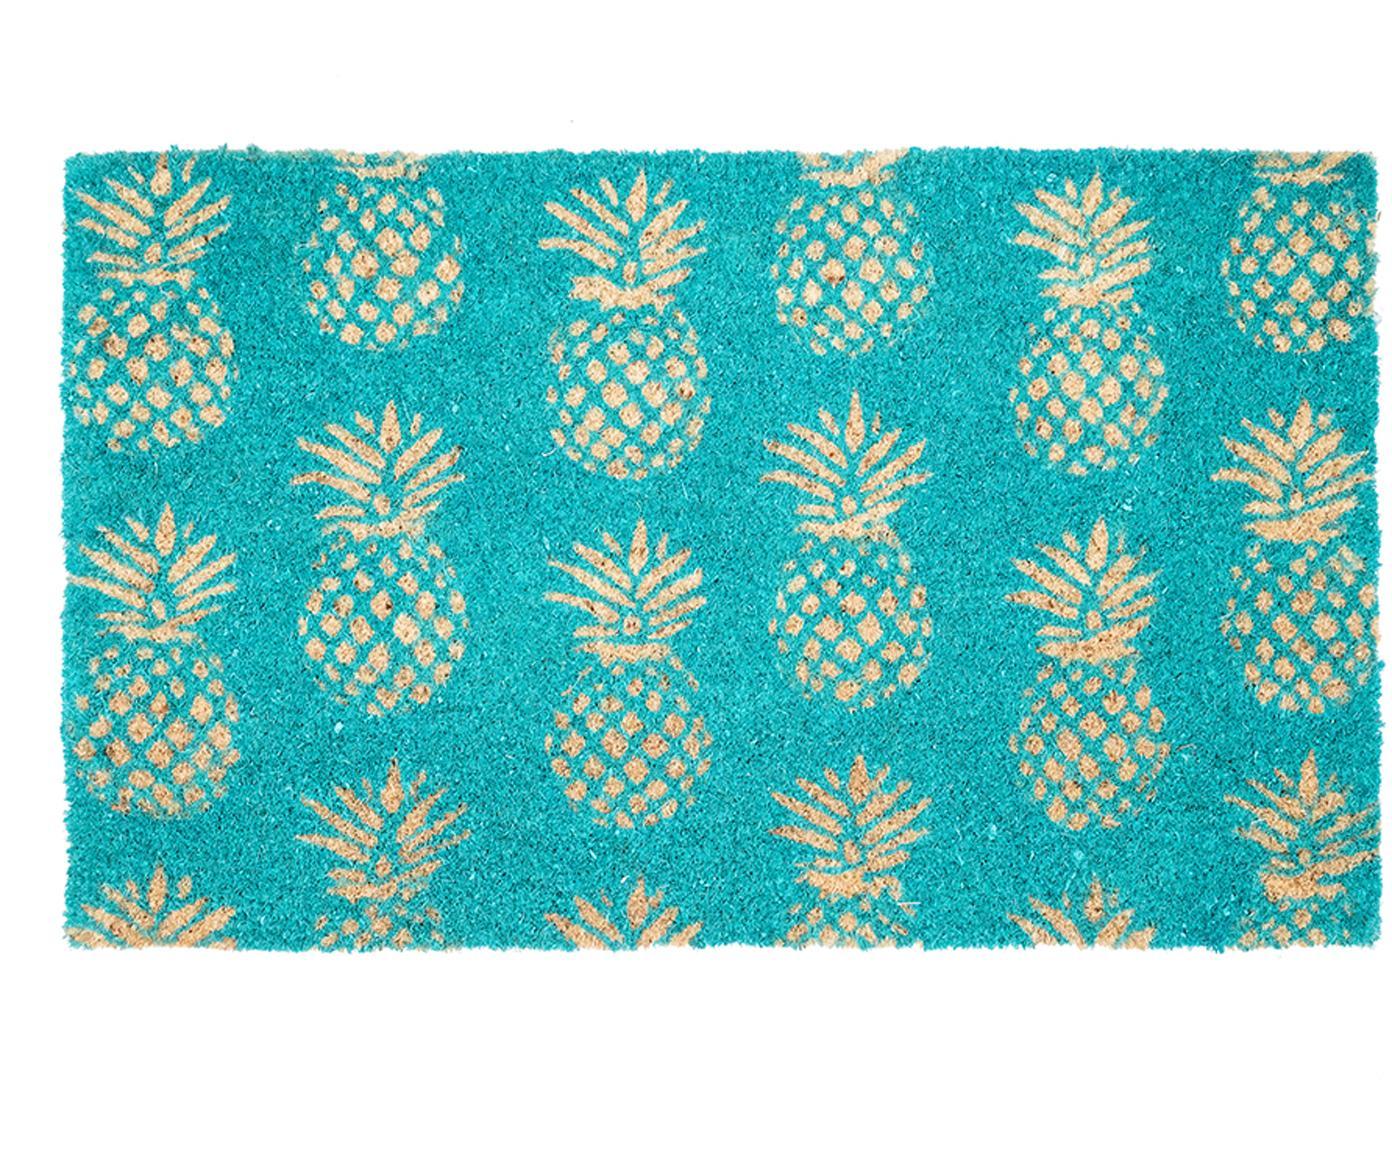 Felpudo Pineapples, Fibras de coco, Turquesa, beige, An 45 x L 75 cm